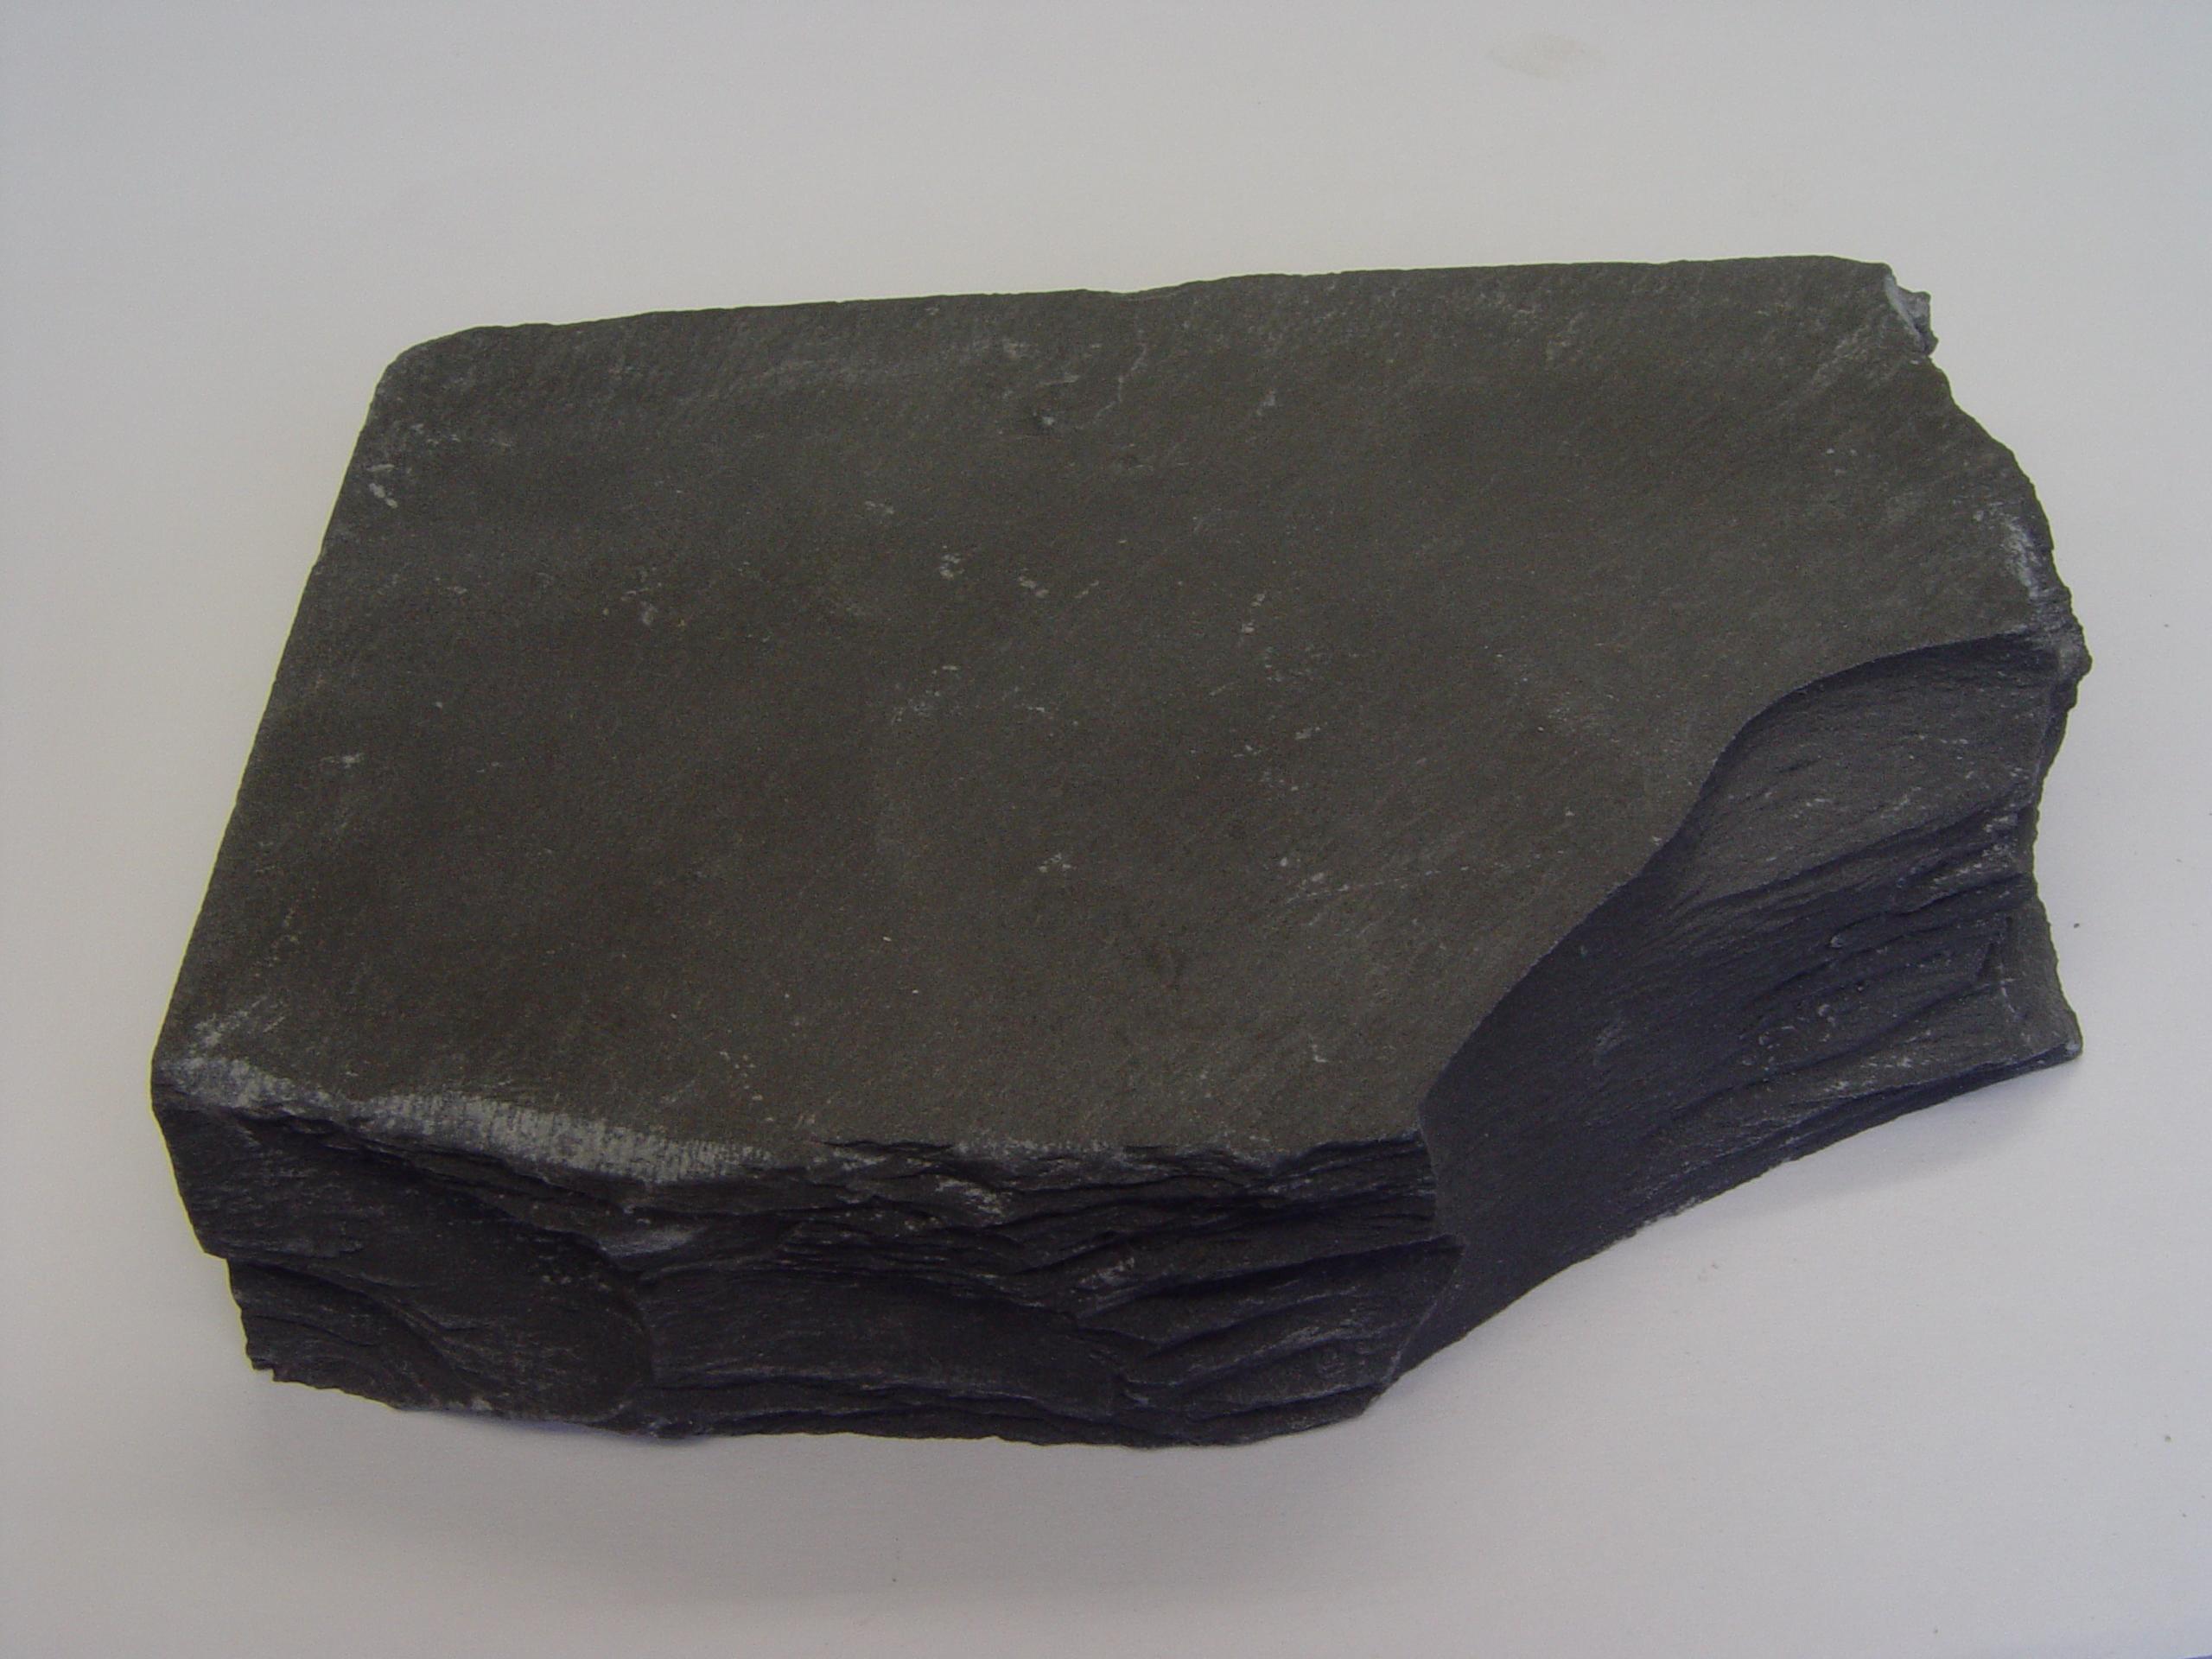 Index of daniela rocce rocce metamorfiche for Pizarra roca